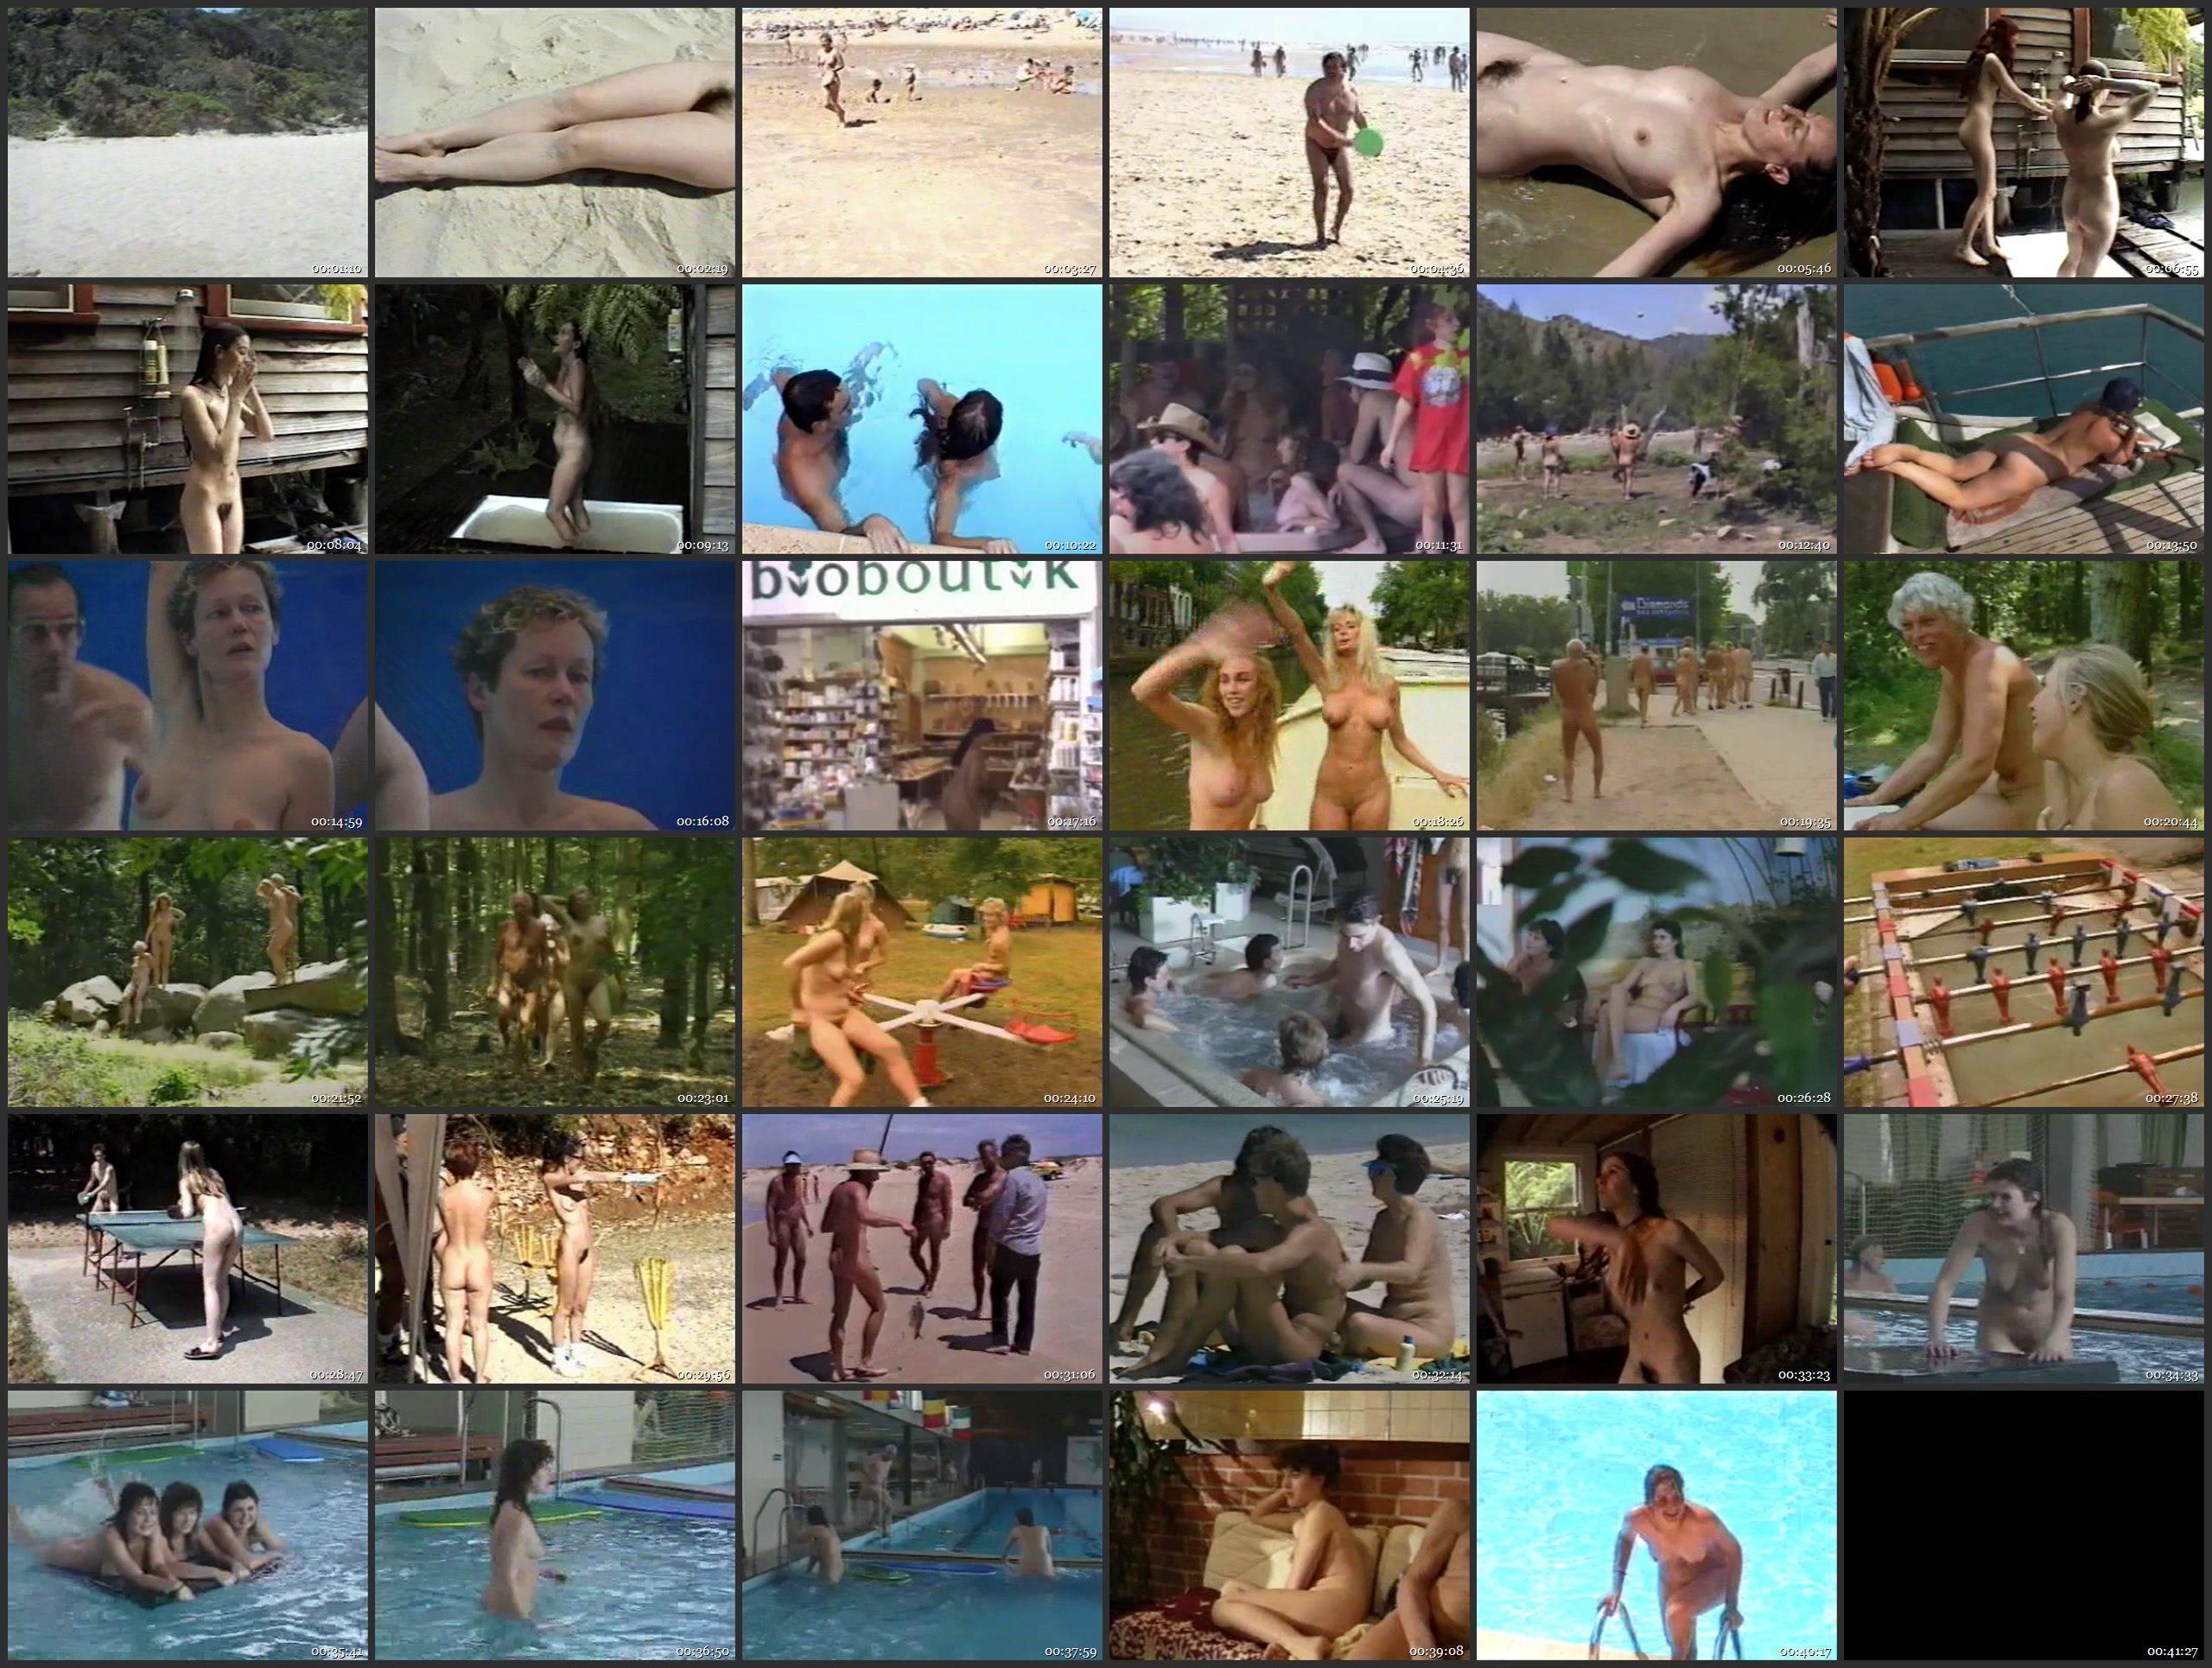 Nudist Videos Collection - BartDude - Thumbnails